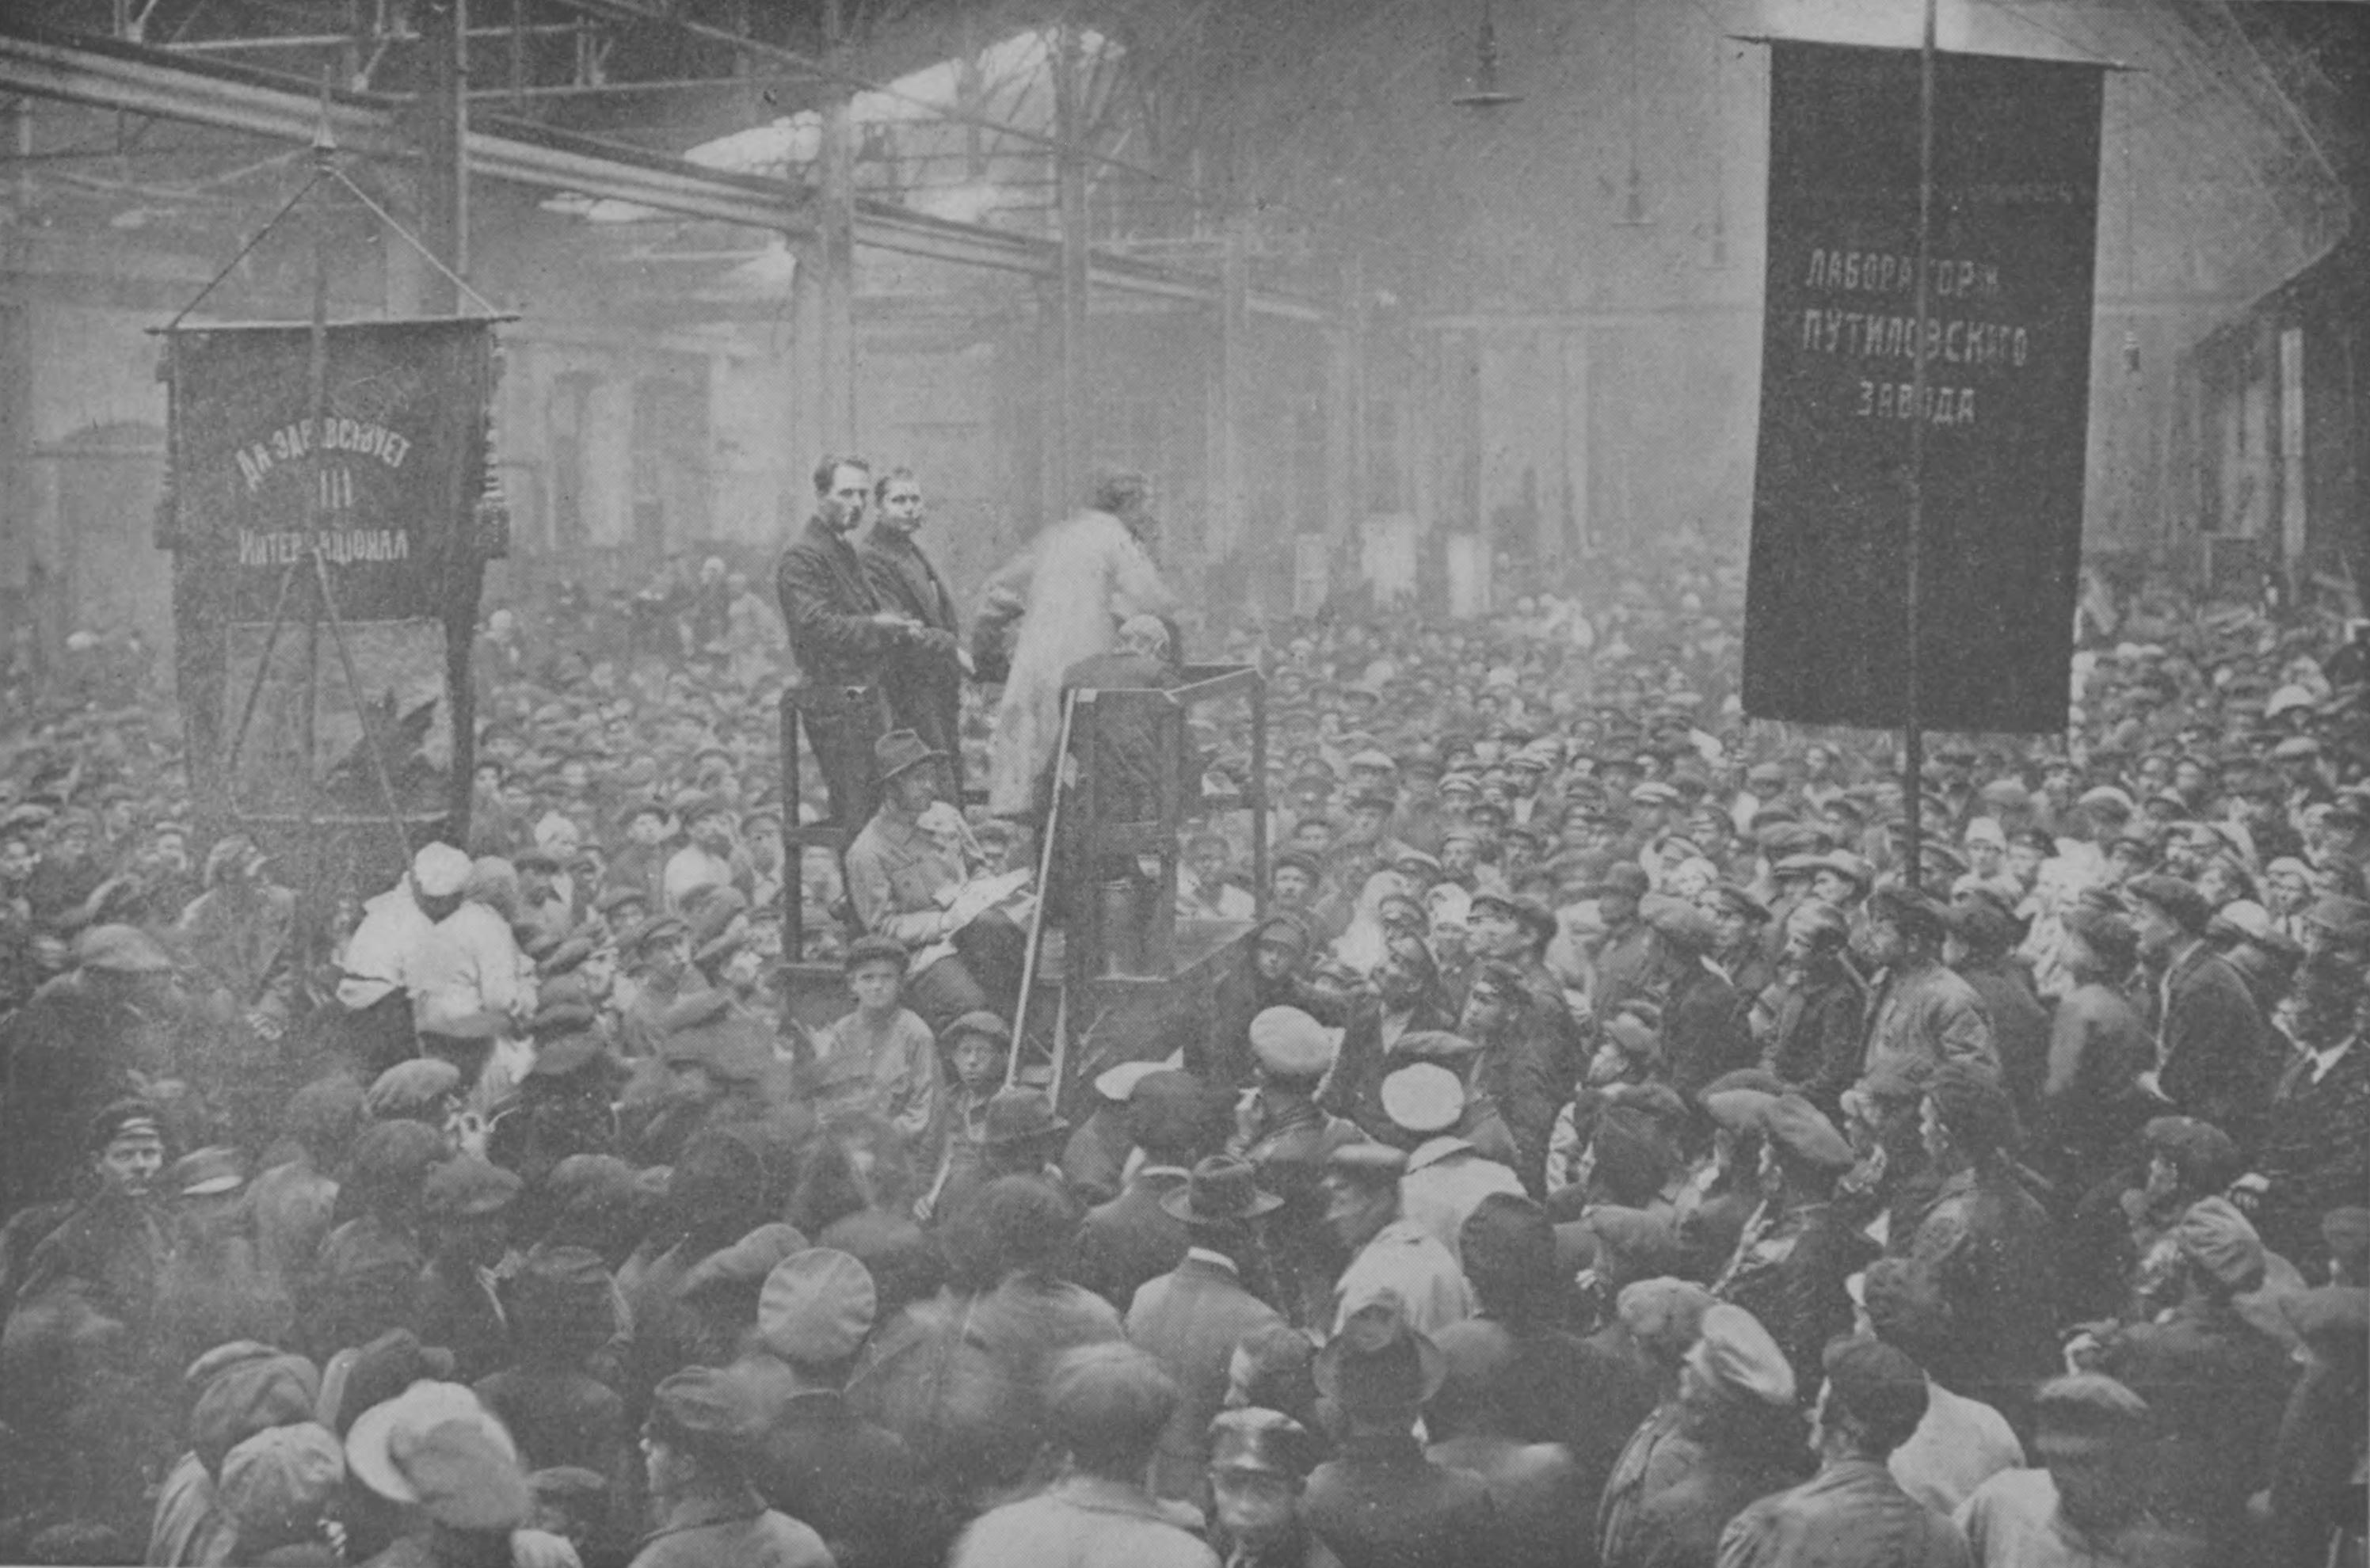 Revolución rusa - Wikipedia, la enciclopedia libre